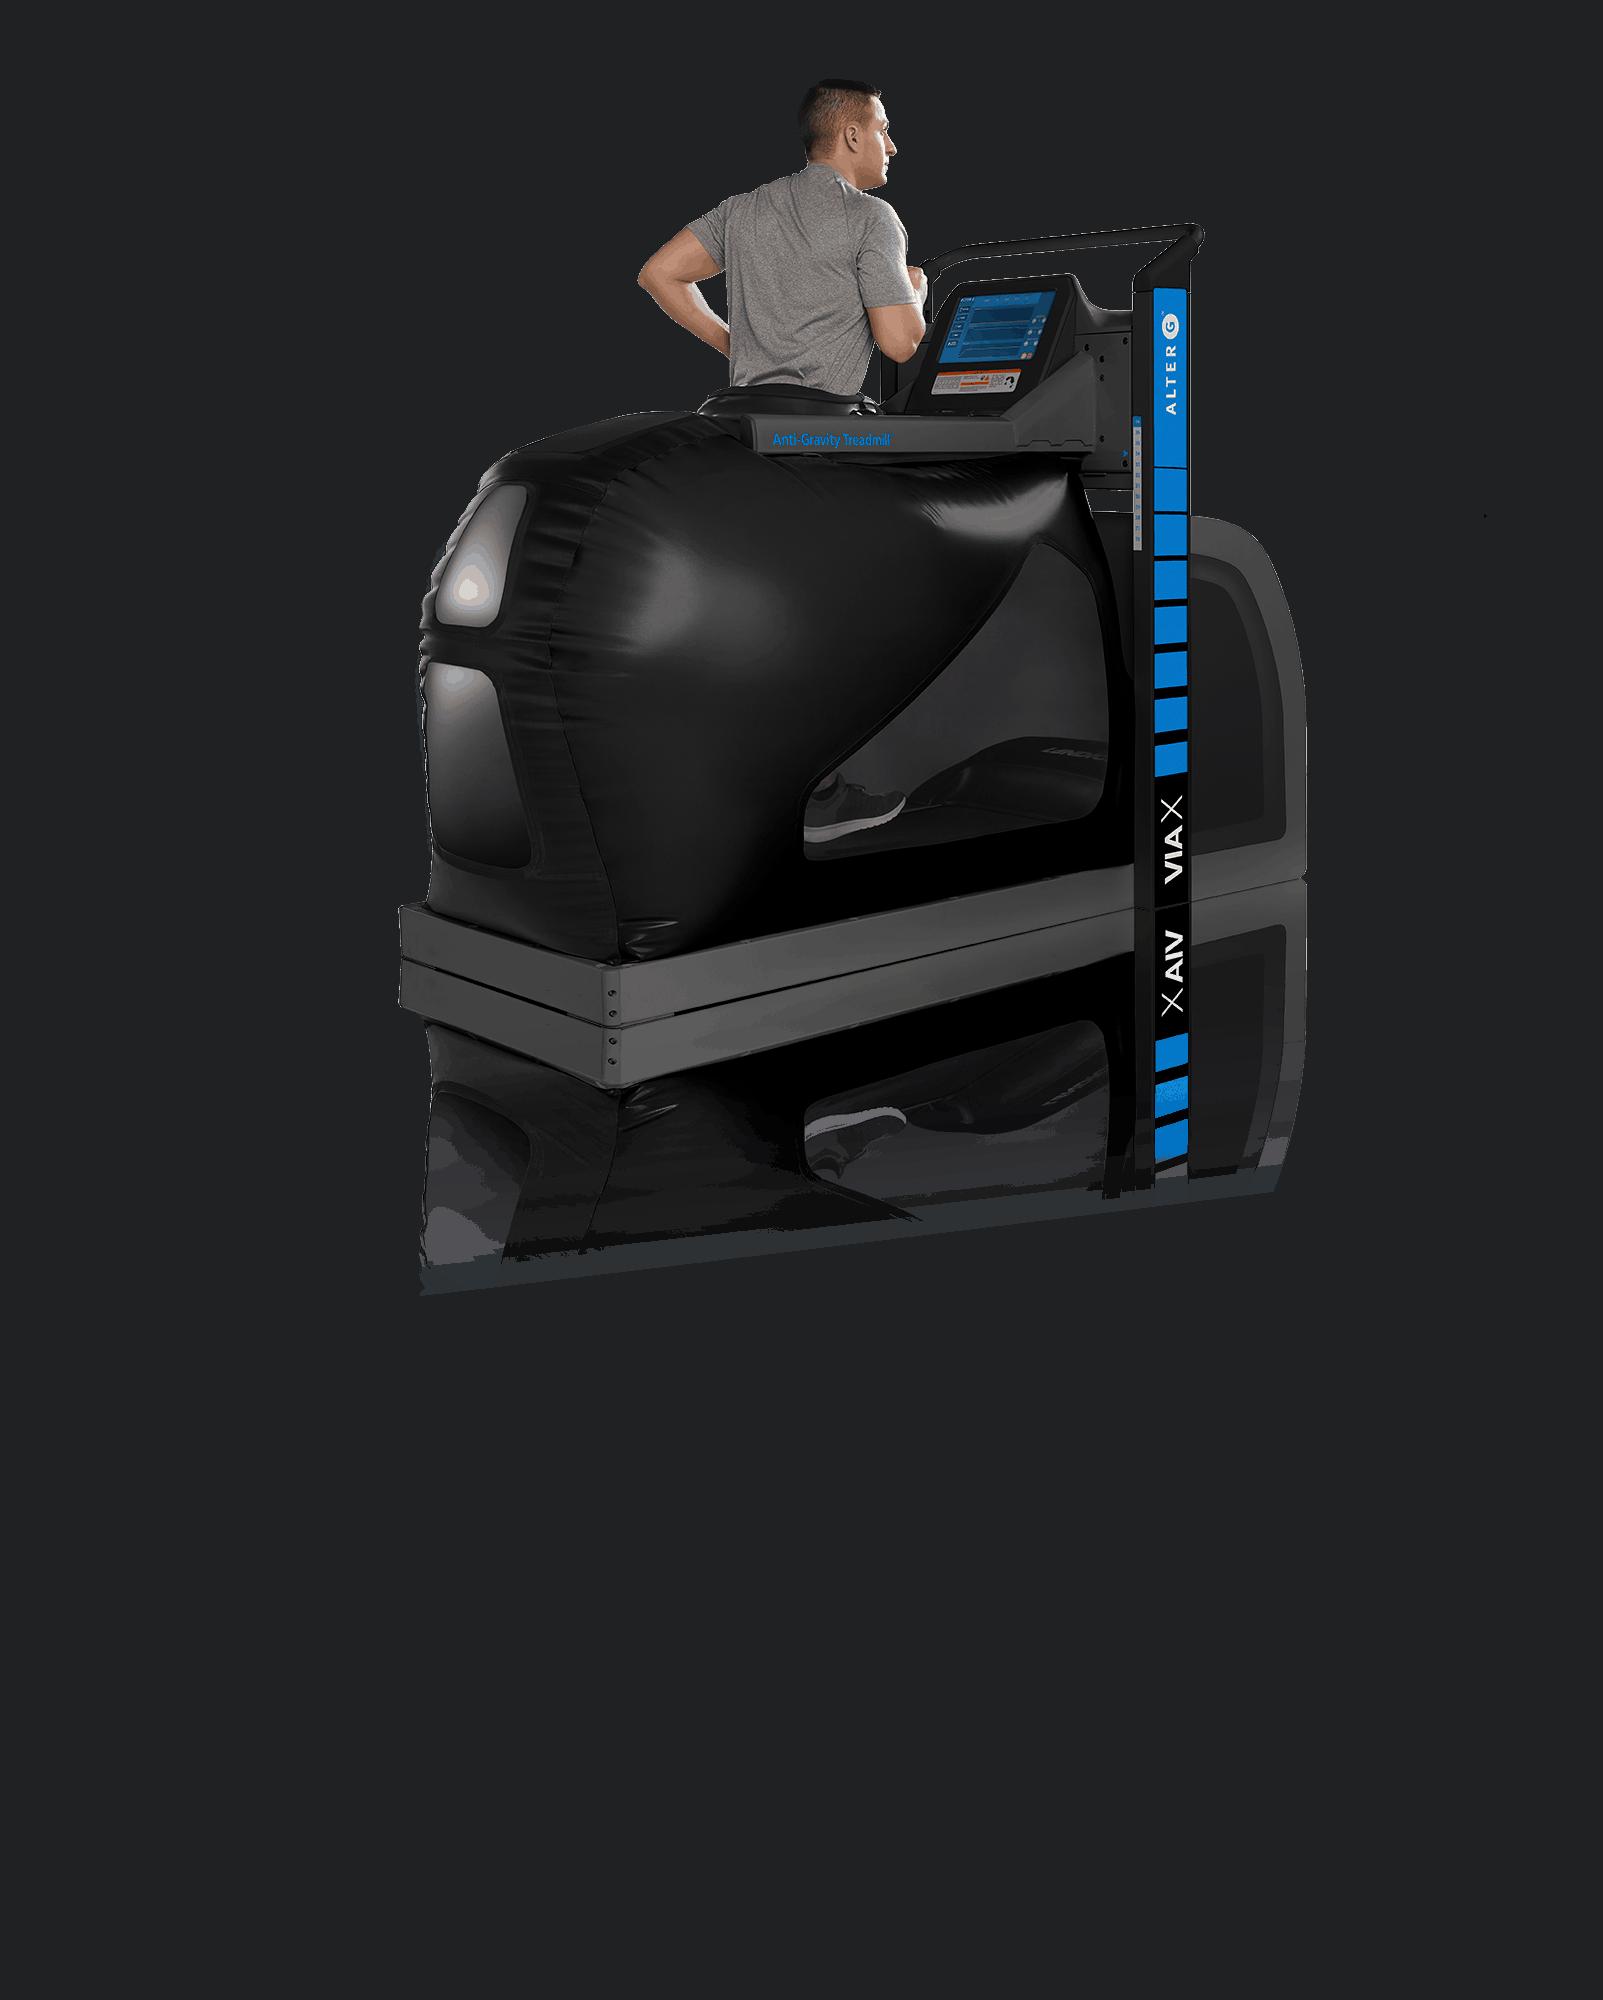 AlterG anti-gravity treadmill London